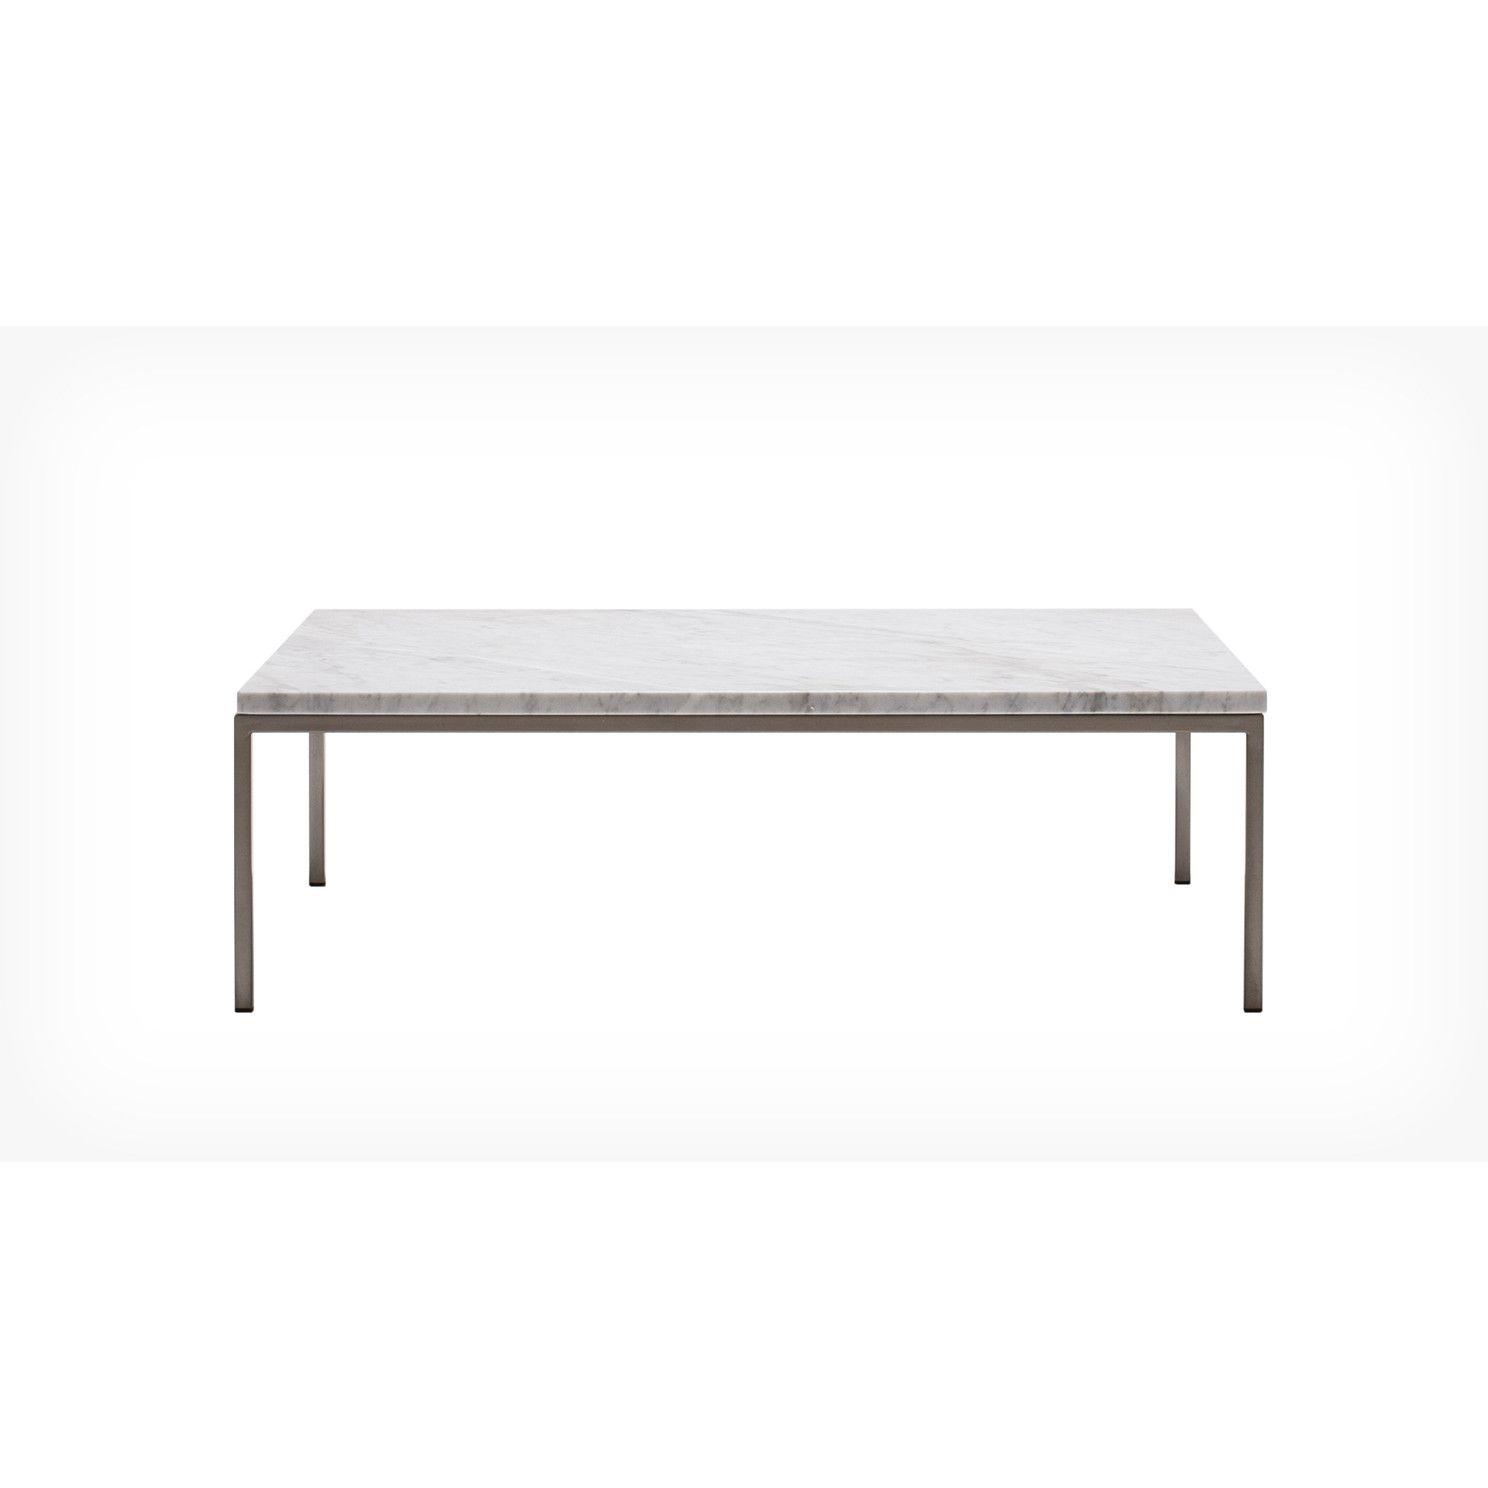 EQ3 Custom Square Coffee Table Seabreeze House Ideas